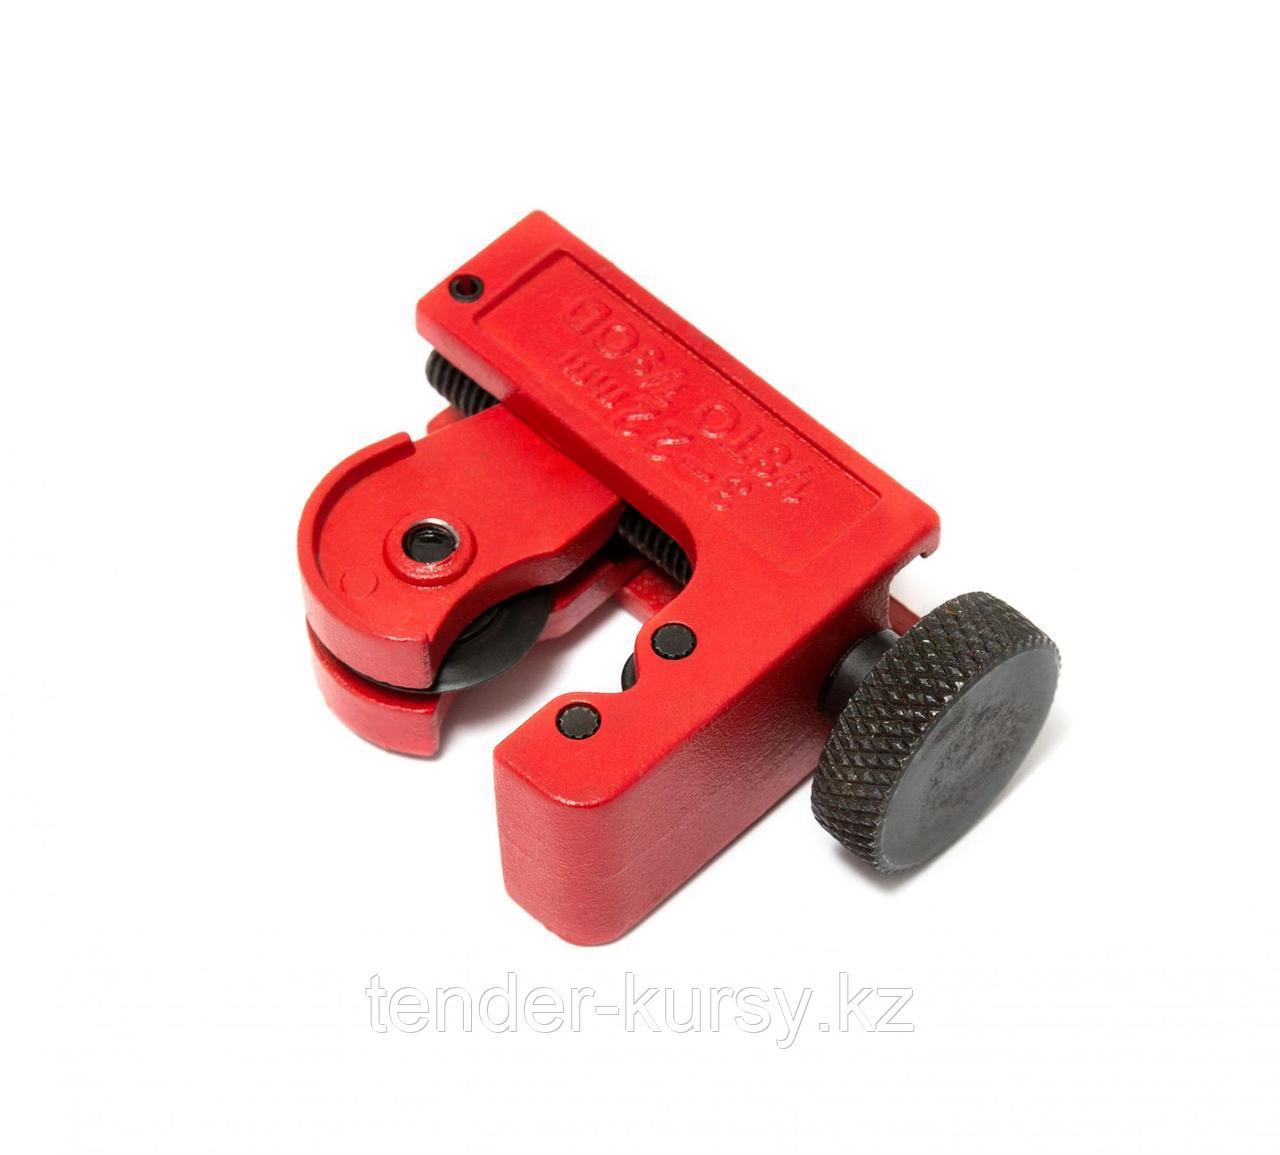 Forsage Труборез мини 3-22мм Forsage F-65602 18074